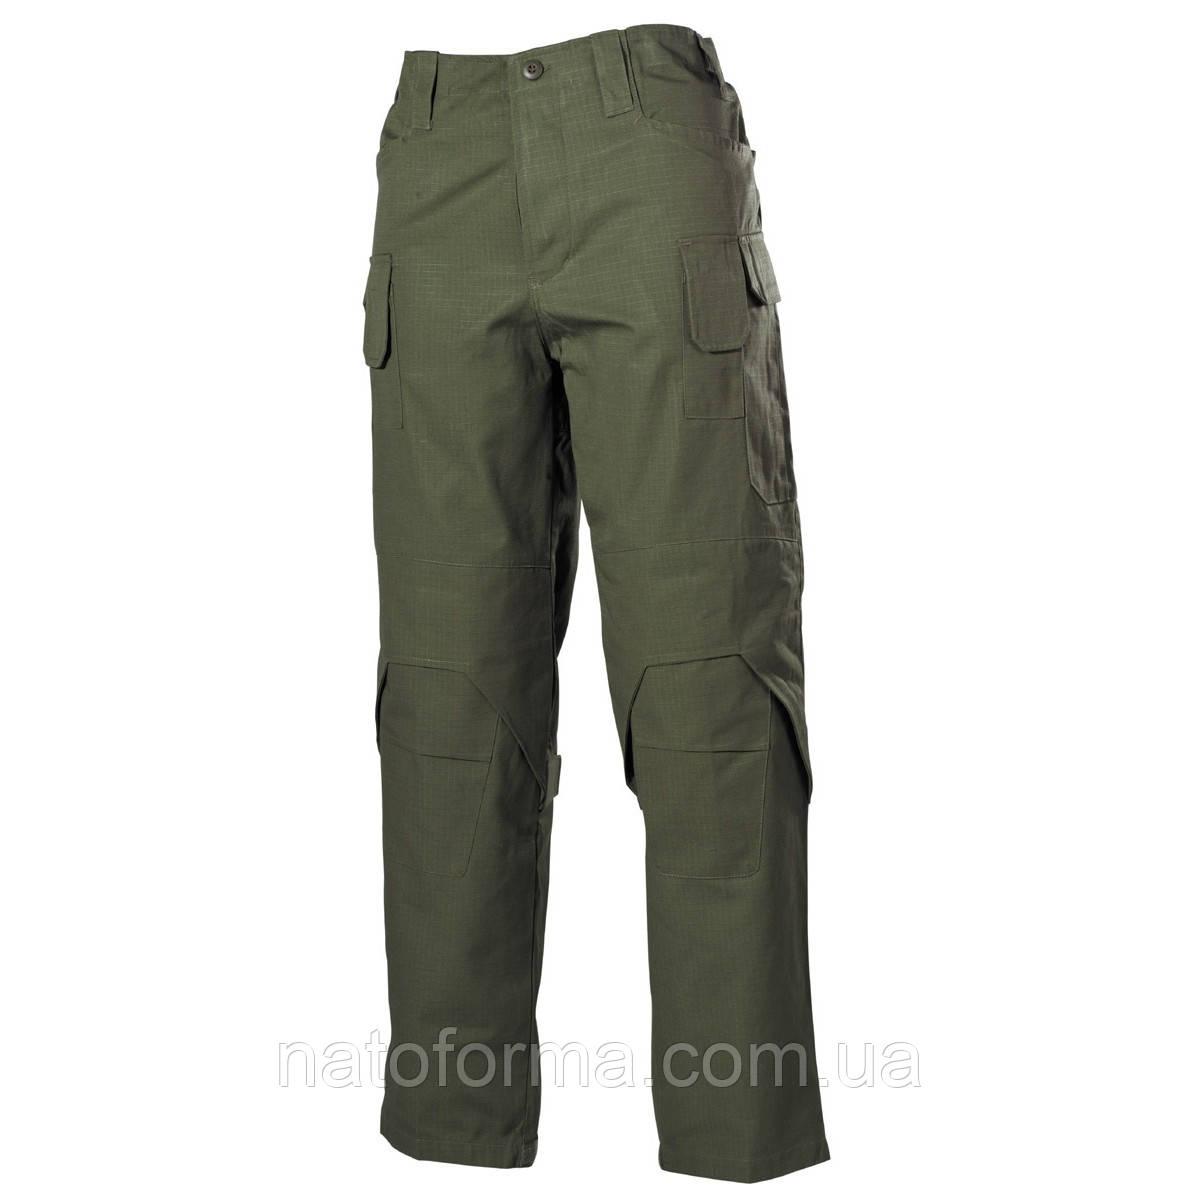 Штаны, брюки тактические Mission, Ny/Co, MFH, олива